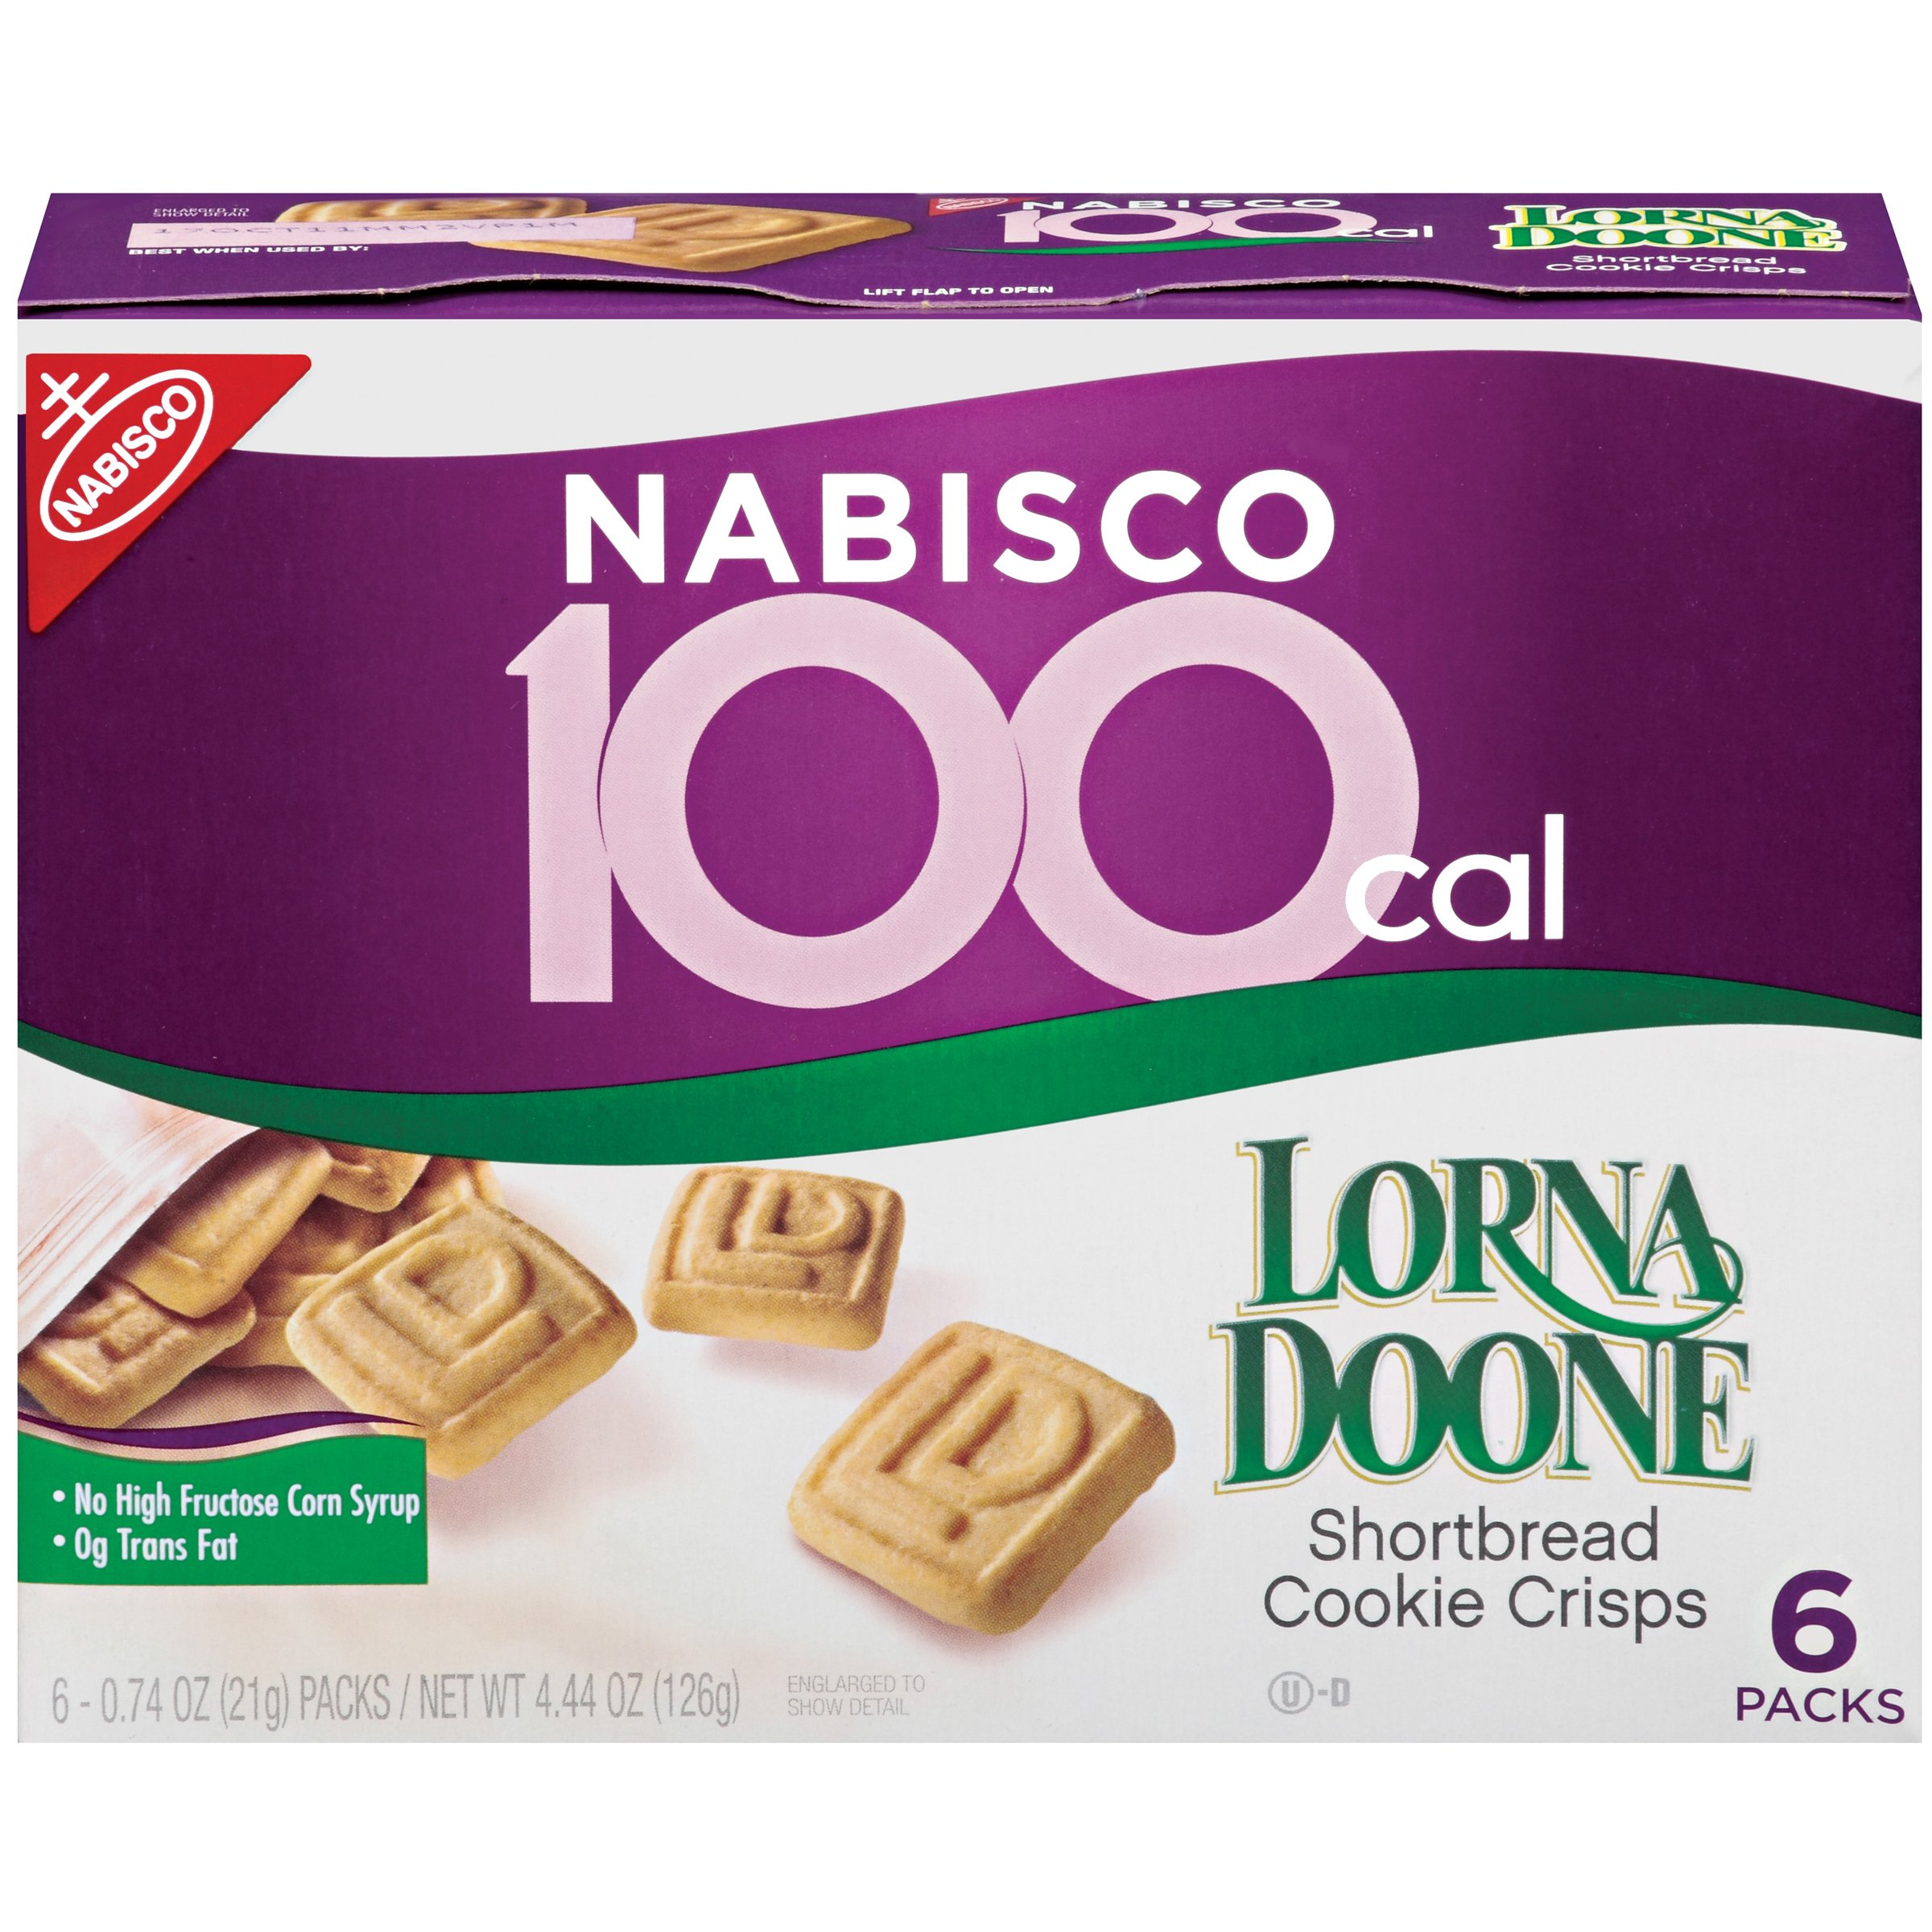 100 Calorie Packs Lorna Doone Shortbread Cookie Crisps, 6-Count Boxes (Pack of 6)